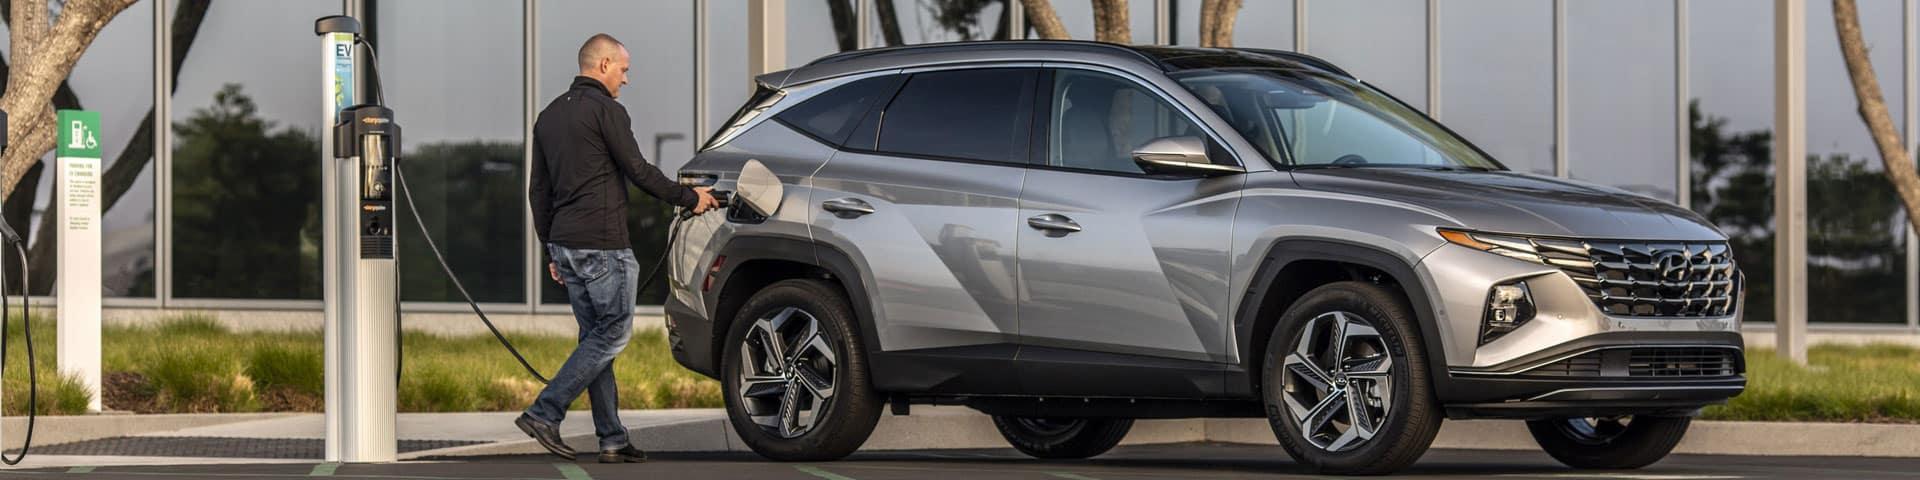 2022 Tucson Hybrid in Seaside, CA